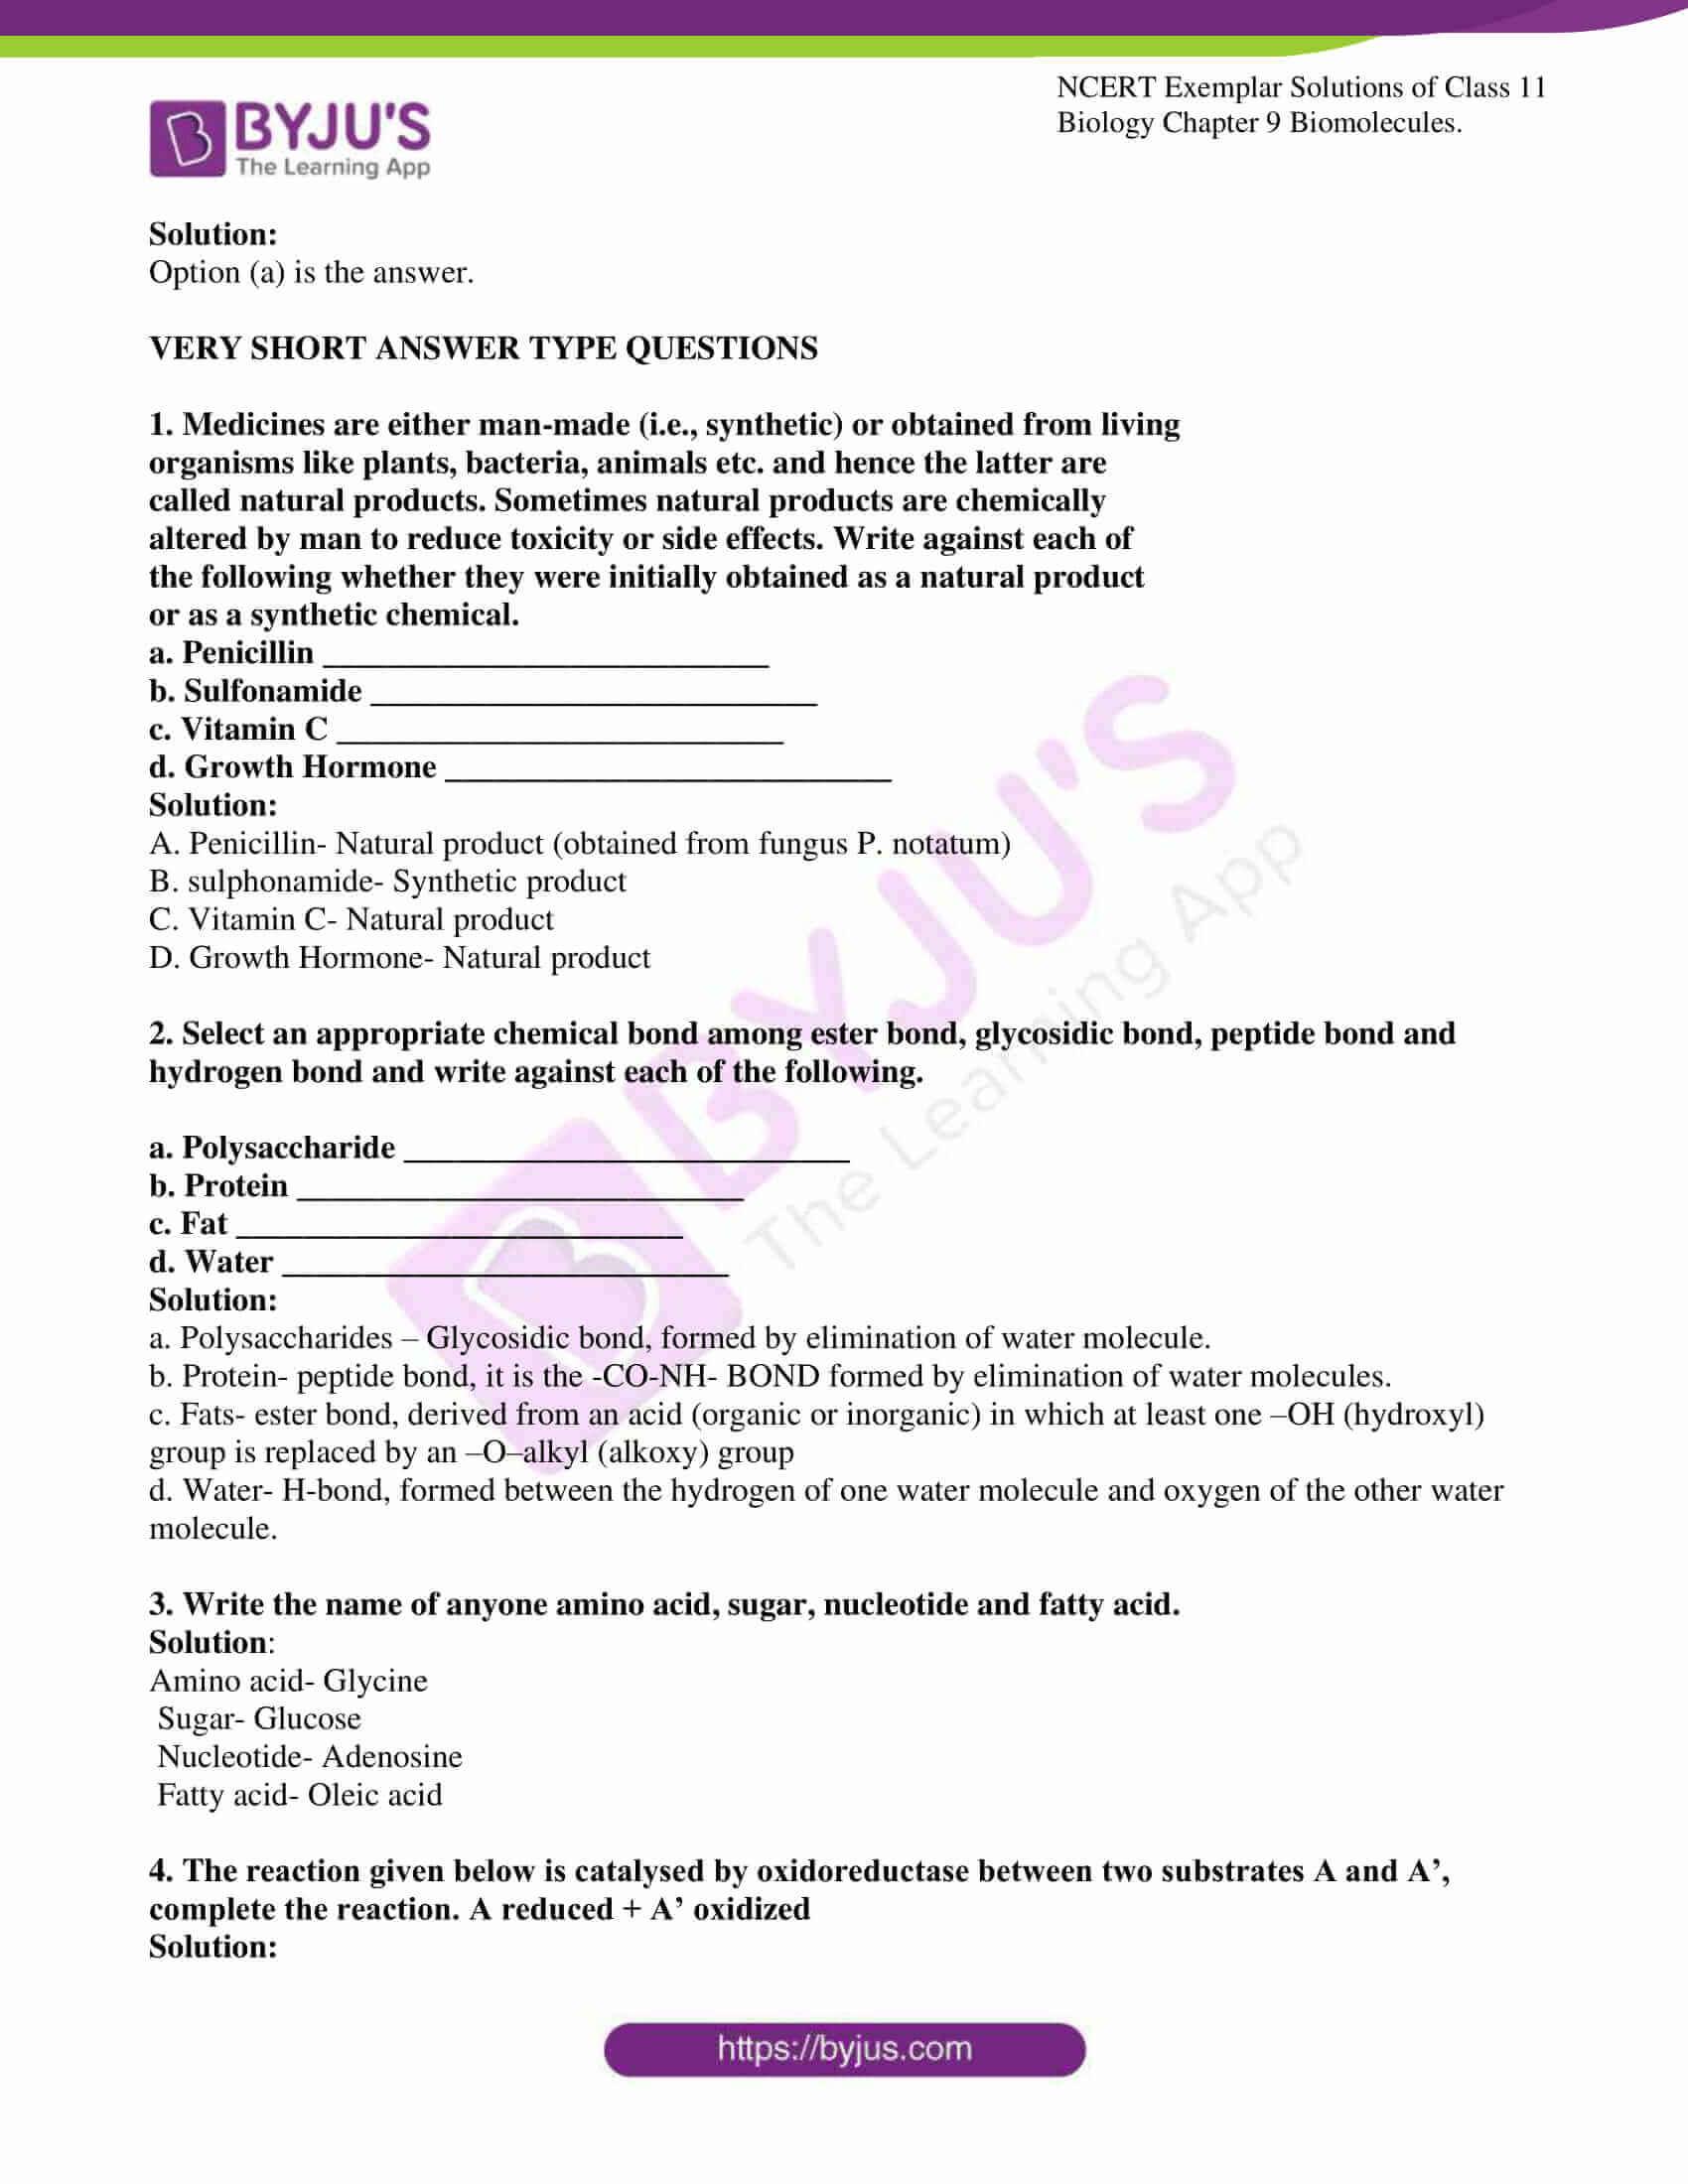 ncert exemplar solutions for class 11 bio chapter 9 4